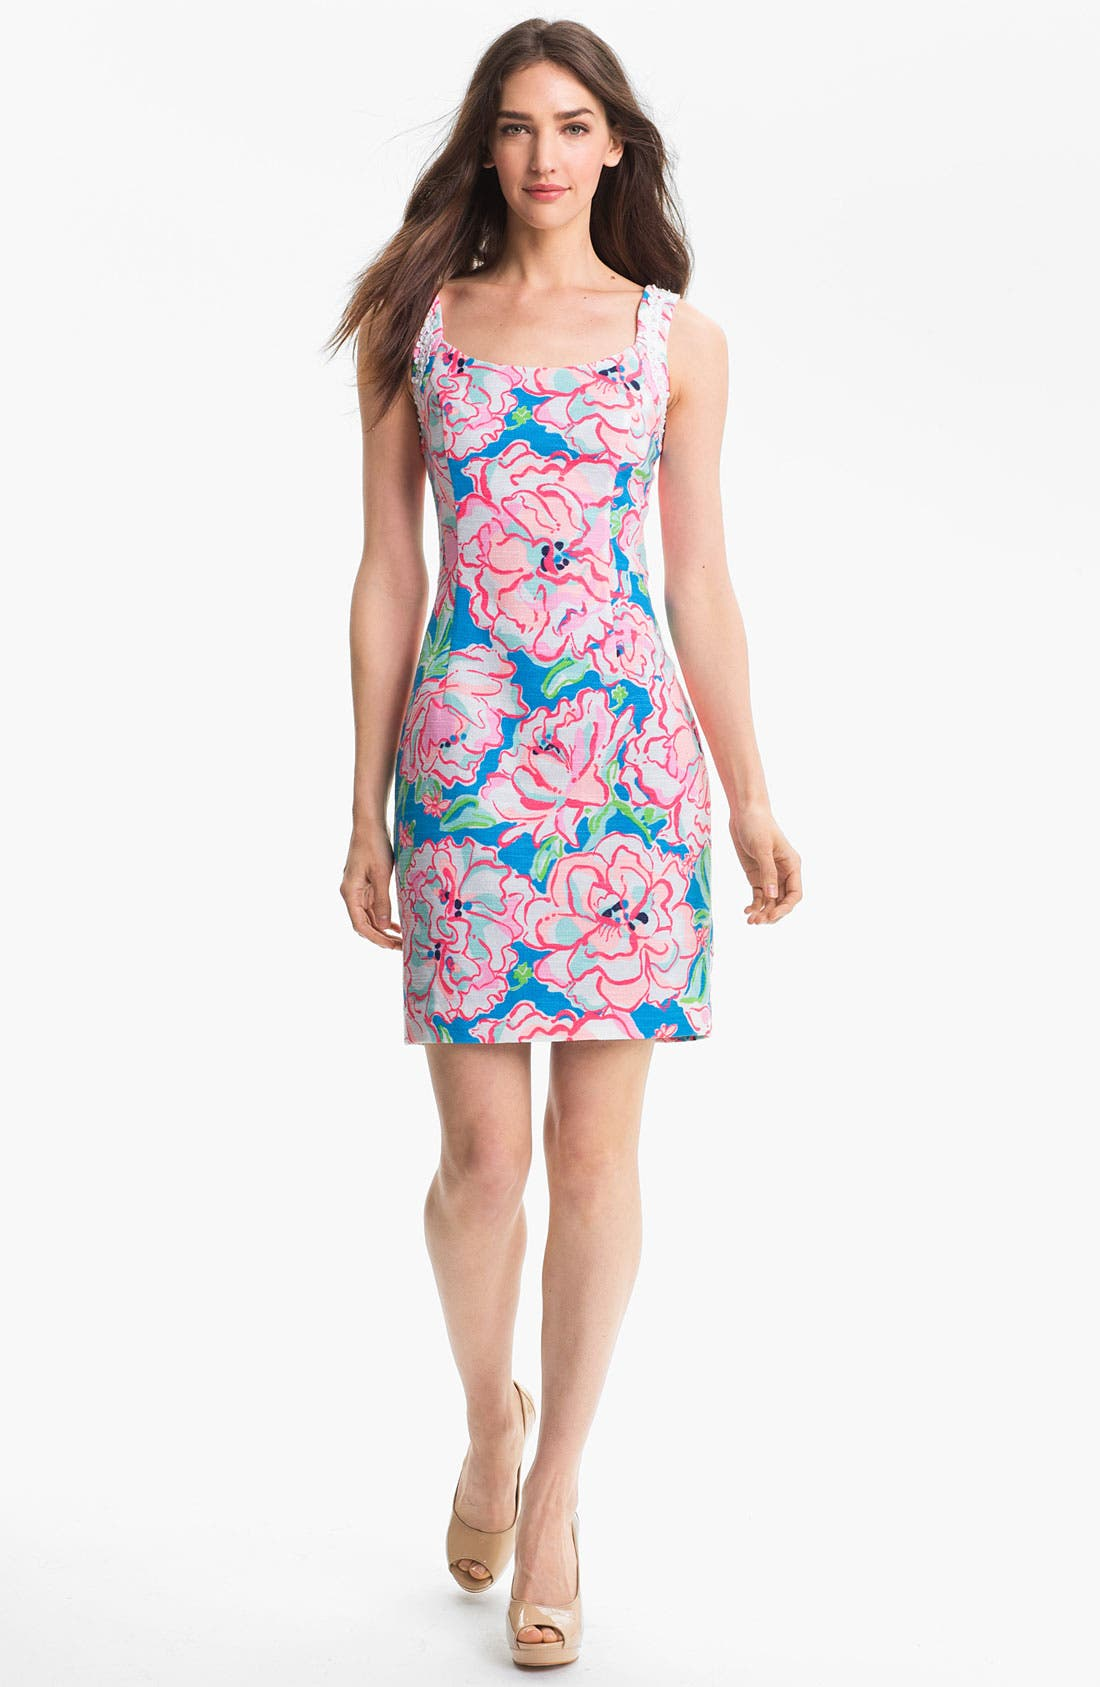 Alternate Image 1 Selected - Lilly Pulitzer® 'Nienie' Print Sheath Dress